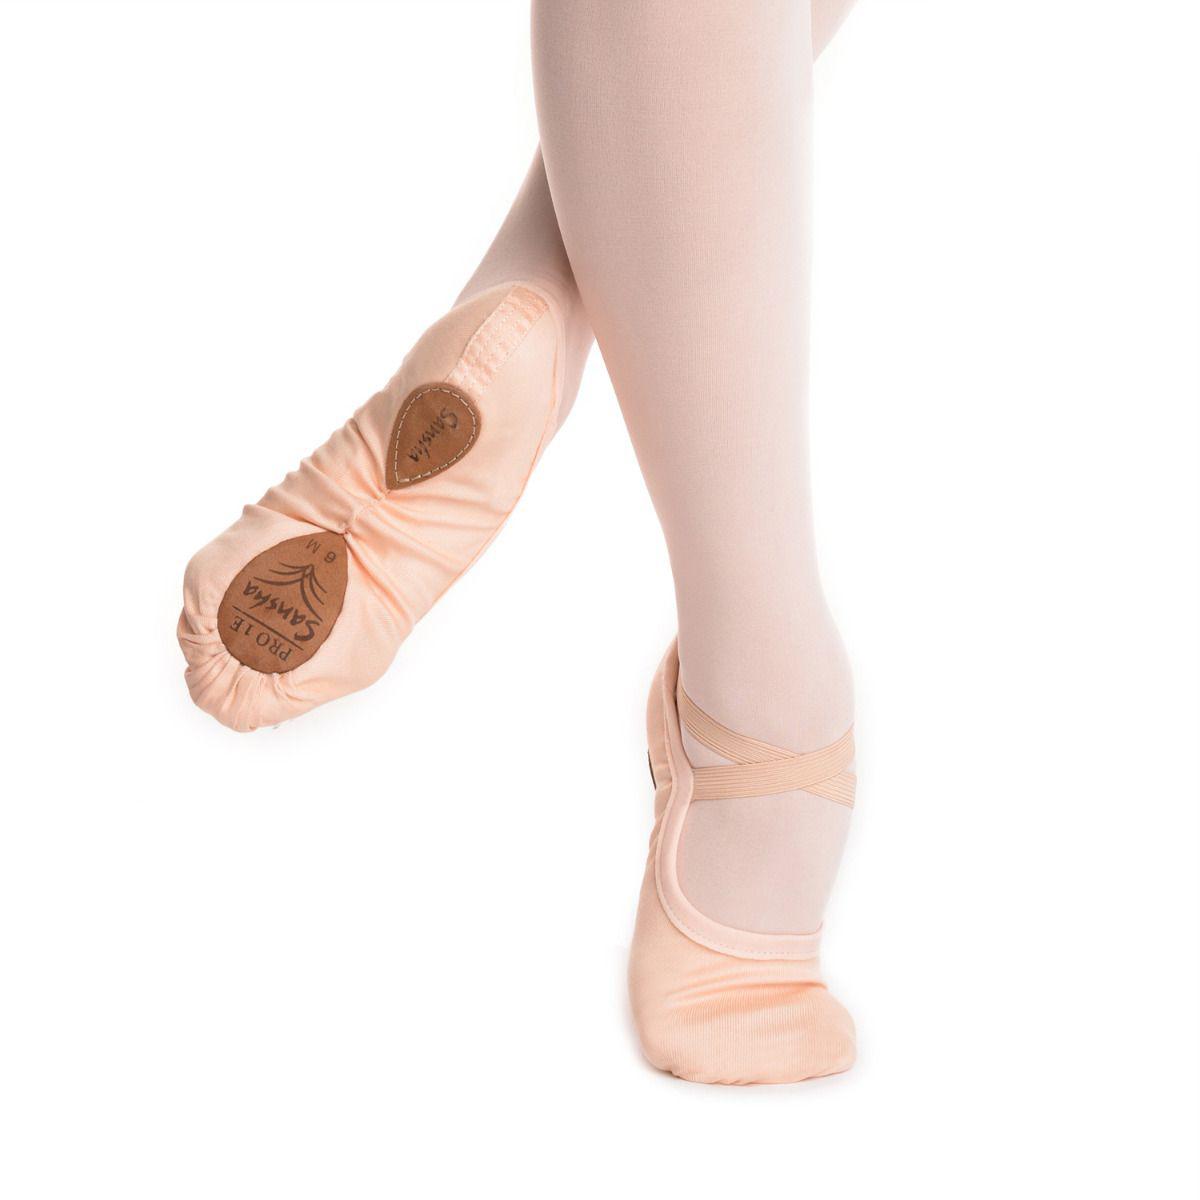 SANSHA - Sansha Bale Patiği Pro Stretch 1E Canvas Açık Pembe